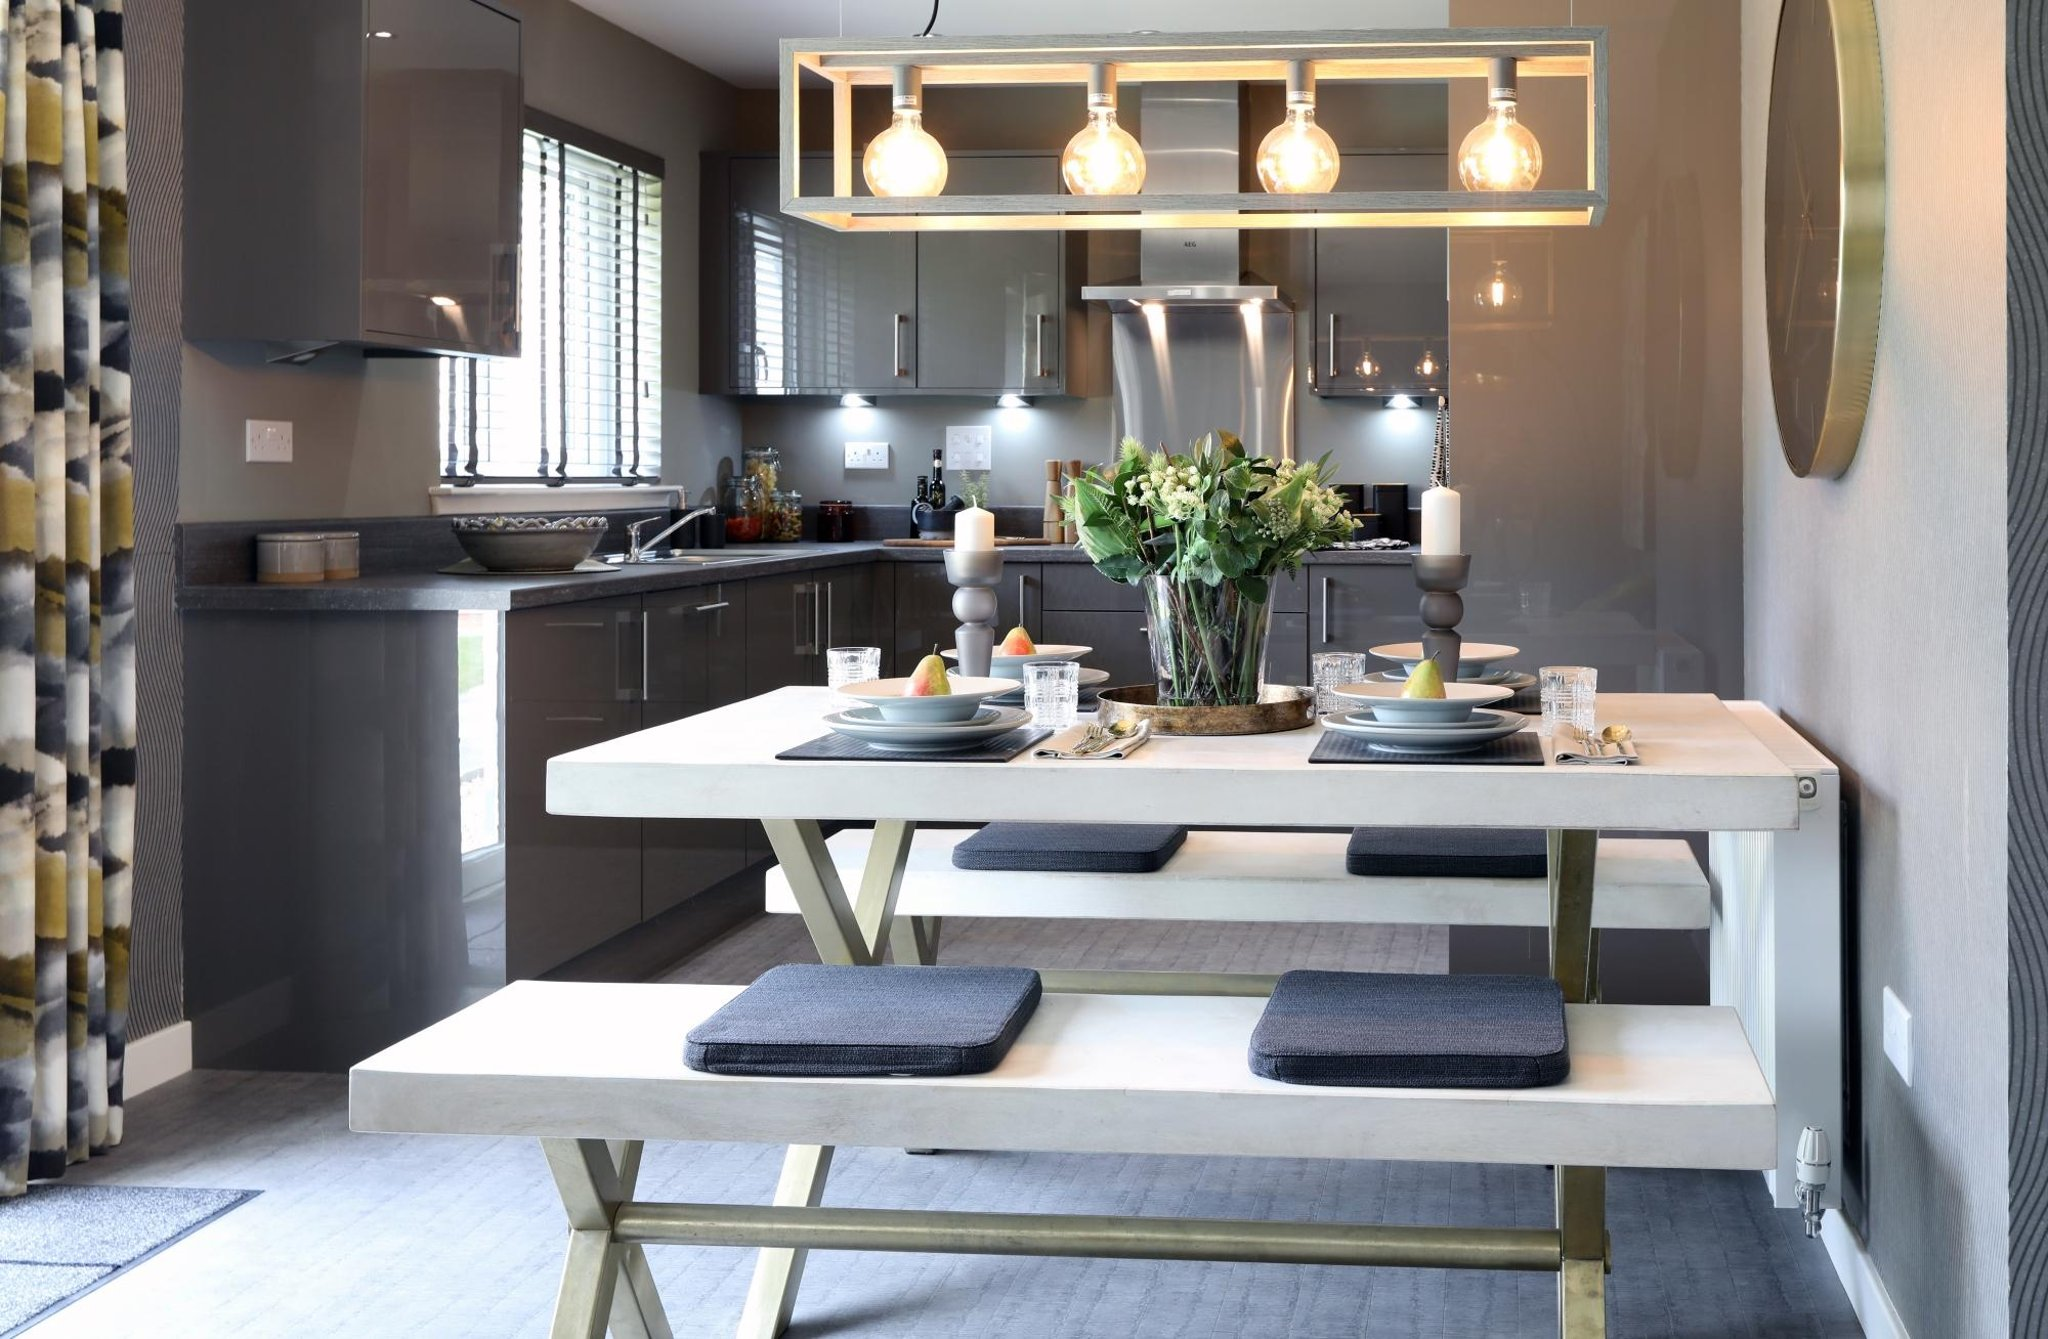 Bangunan baru: Merchant Homes akan merilis tiga tipe rumah di Glasgow's Lochwood Gardens